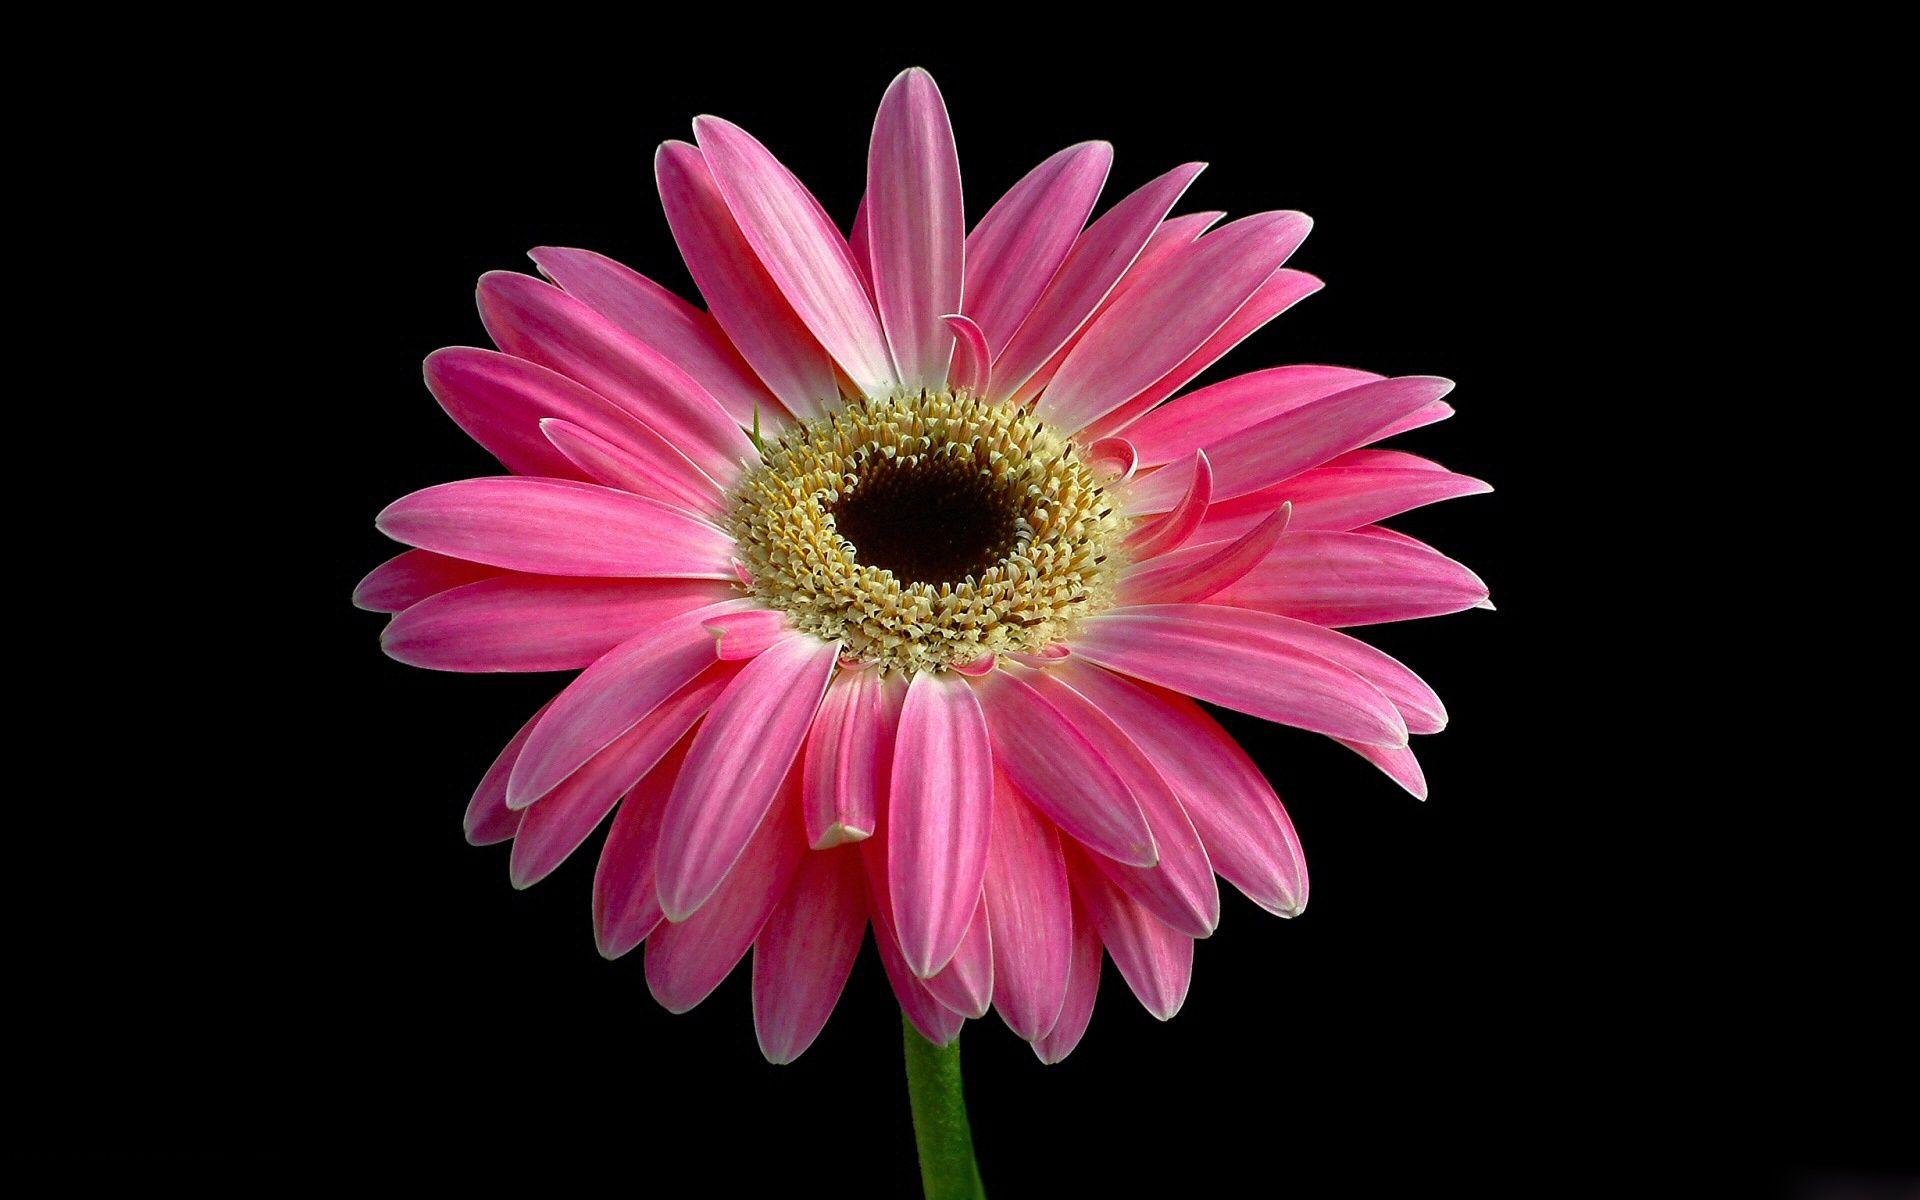 hinh anh hoa cuc dep 40